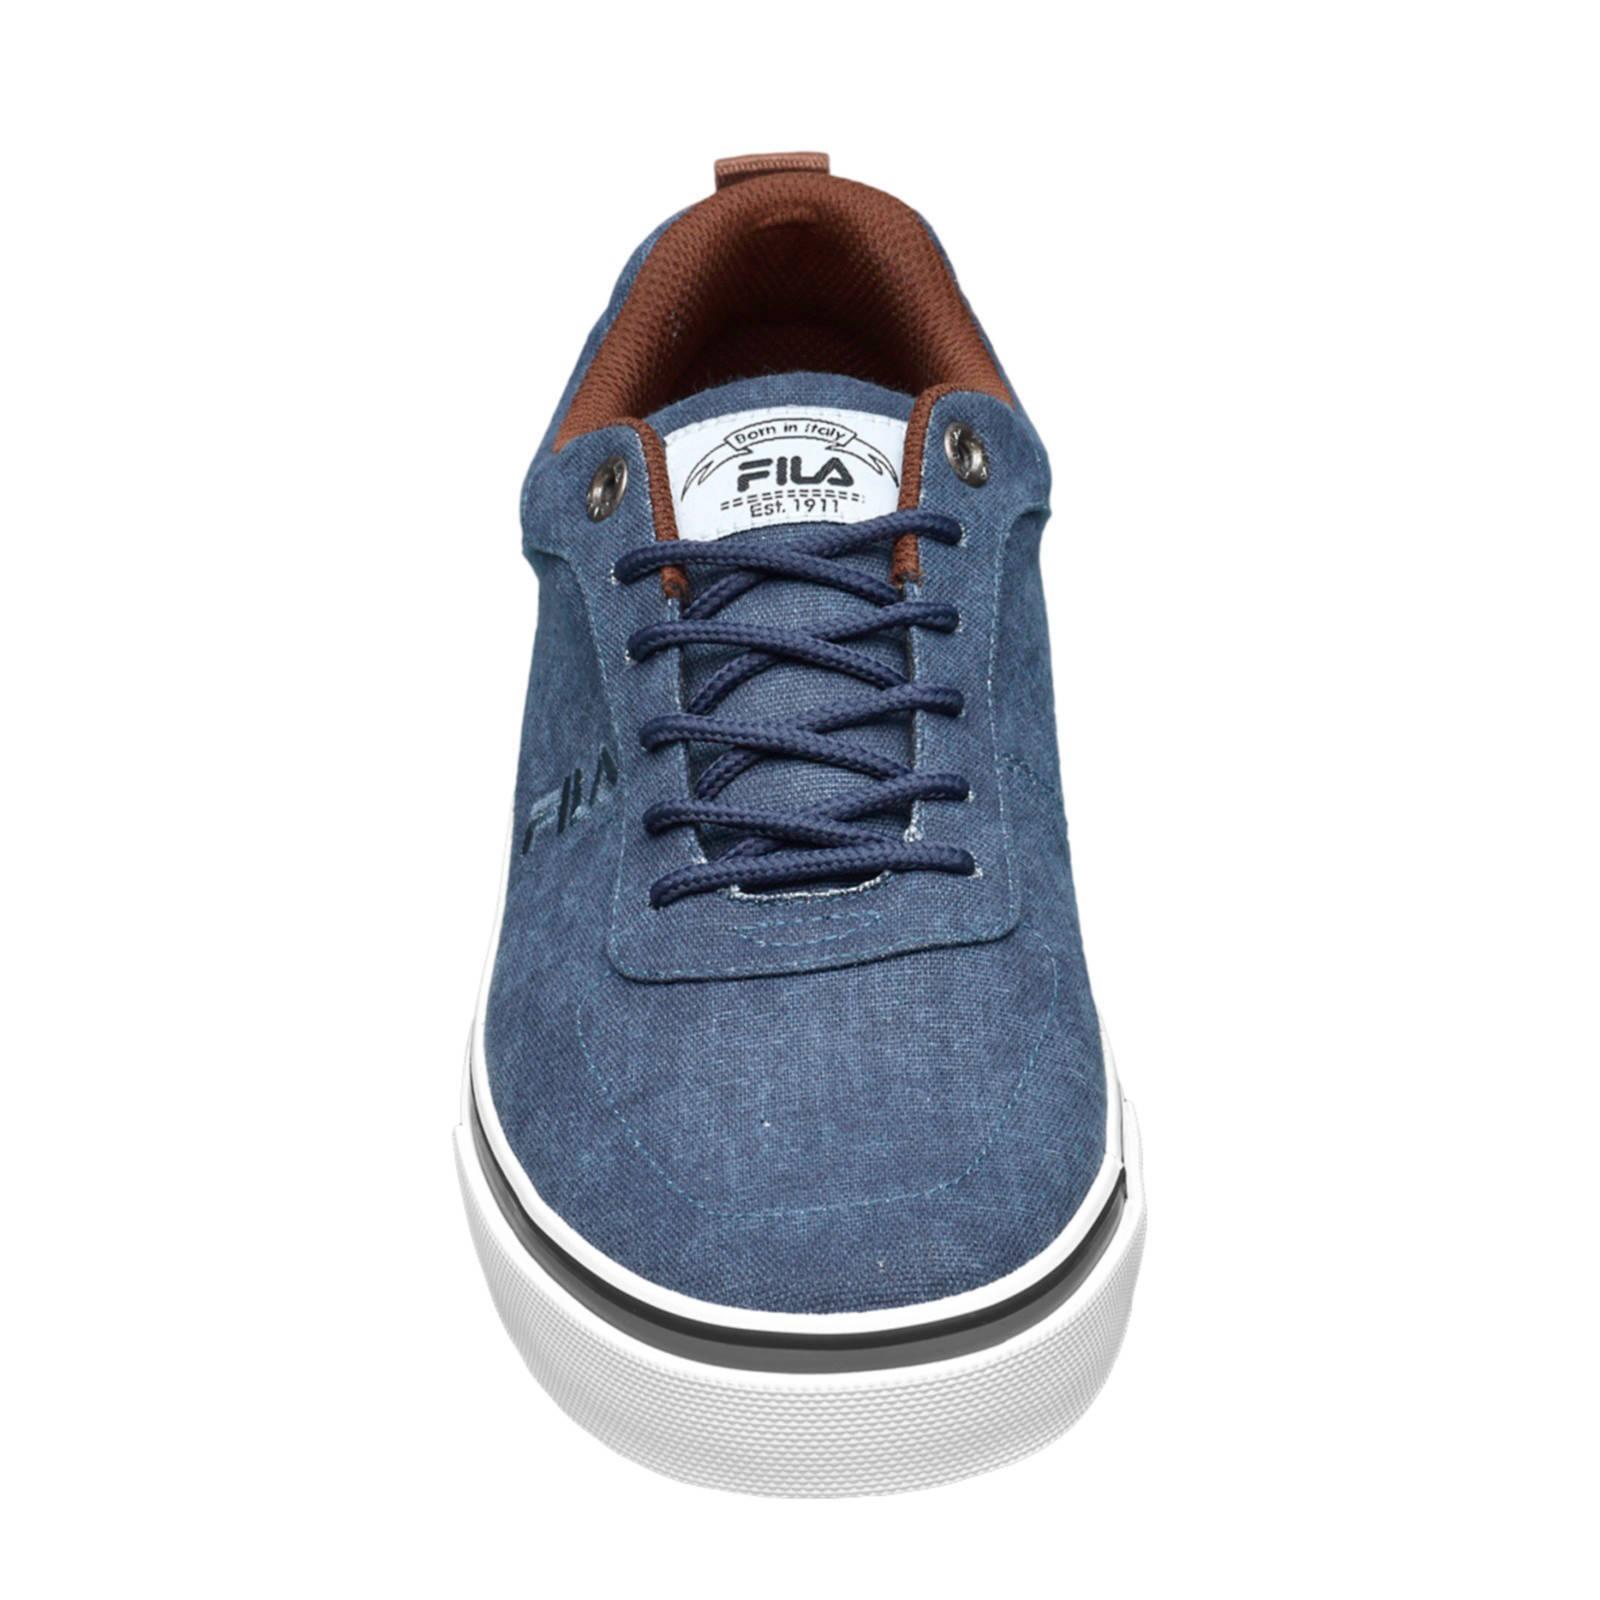 Fila canvas sneakers denimblauw | wehkamp